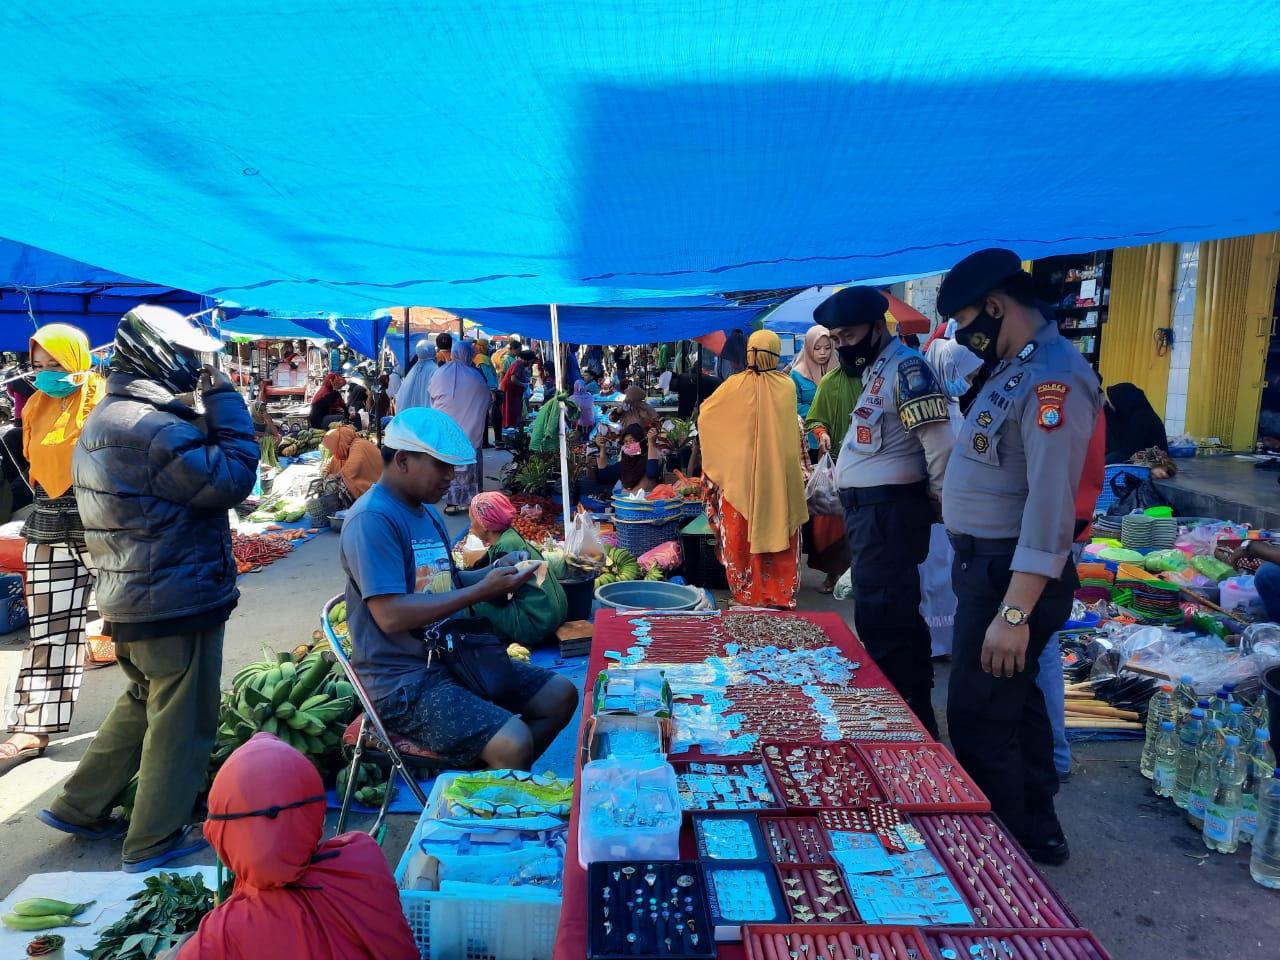 Sat Sabhara Polres Polman Laksanakan Patroli Jalan Kaki Di Pasar Sentral Pekabata